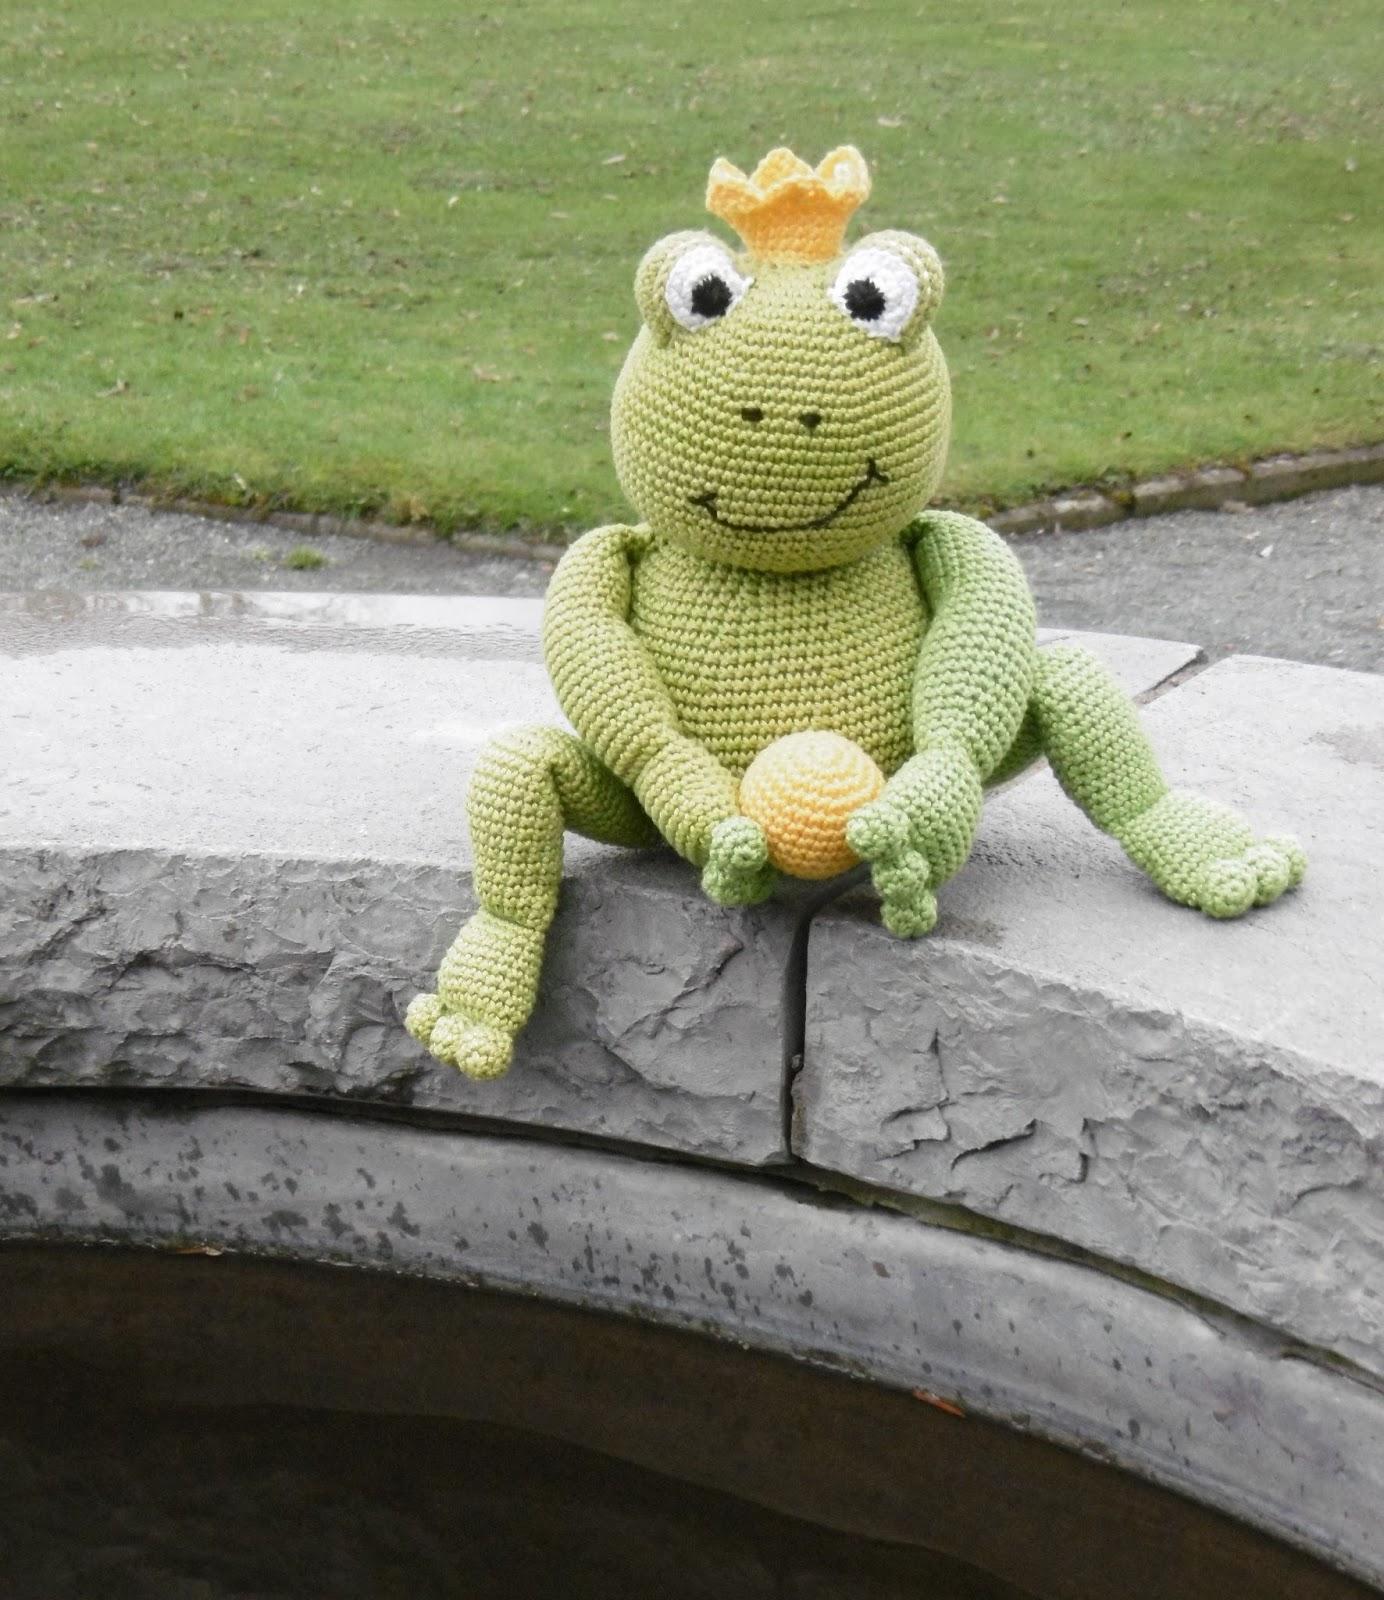 Crochet pattern Frog - amigurumi - instant download pdf (mit ... | 1600x1384